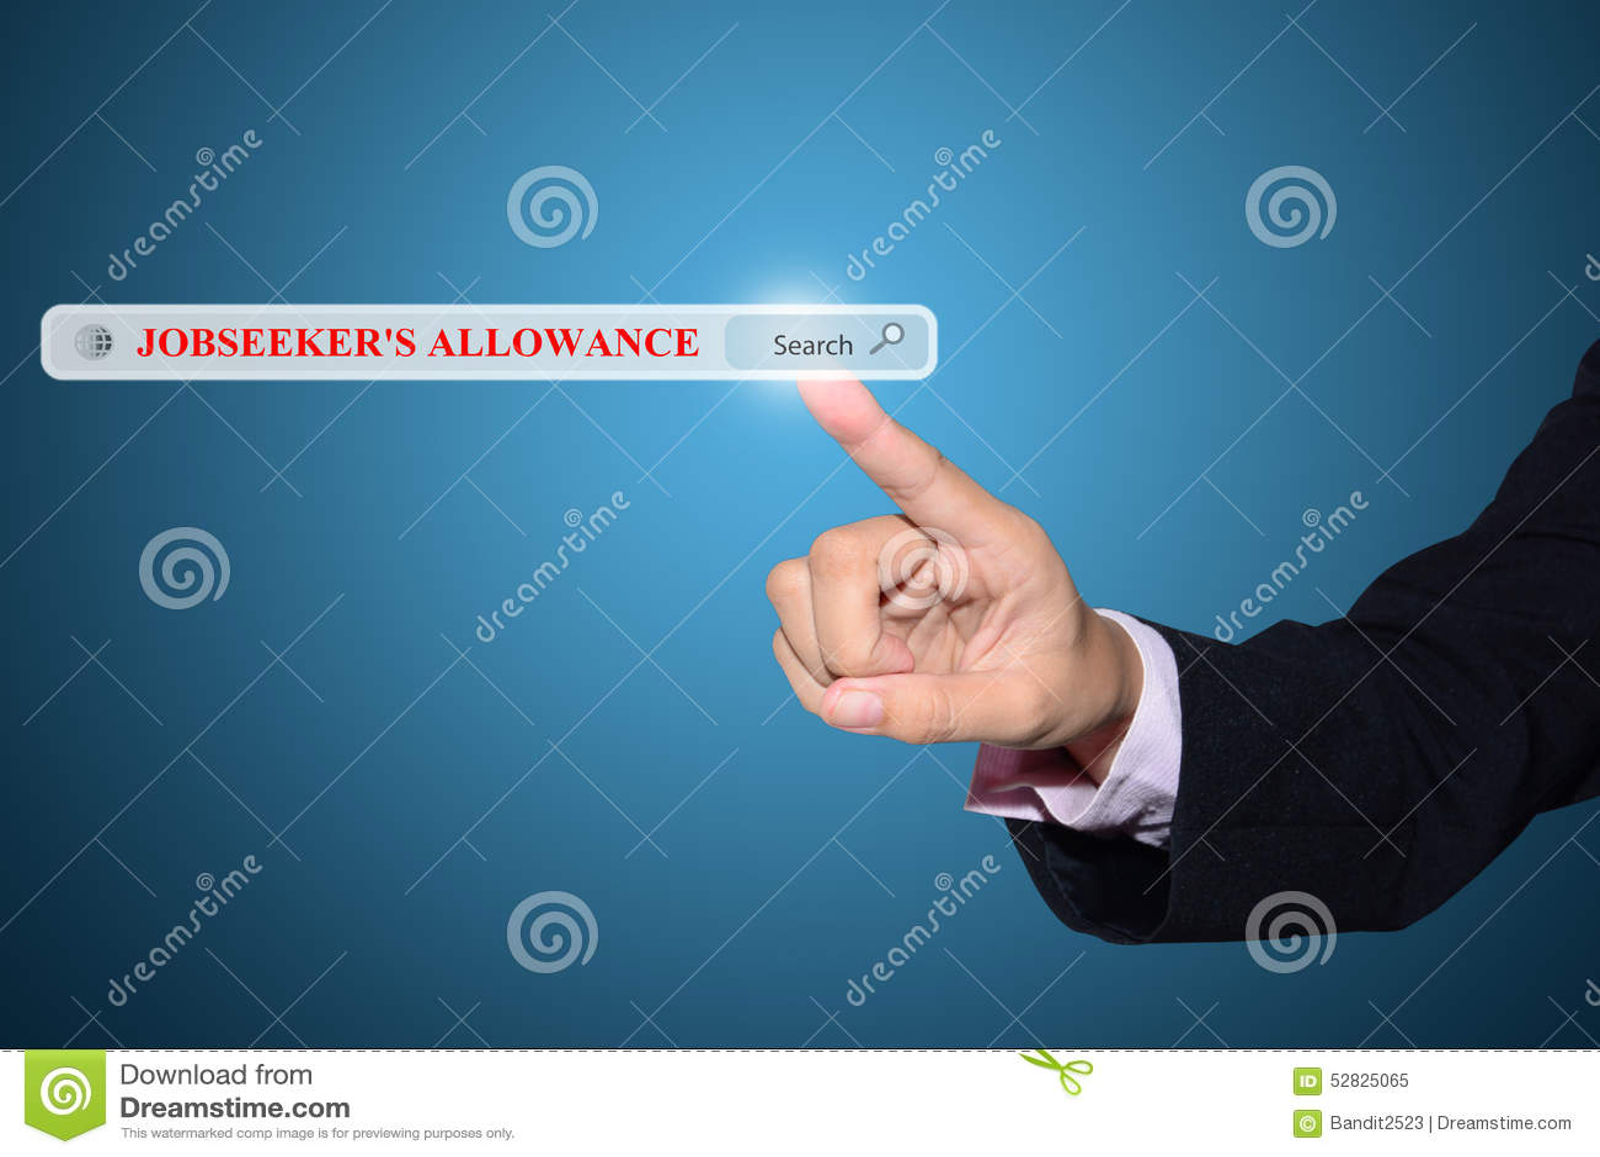 jobseeker s allowance search stock photo image 52825065 jobseeker s allowance search